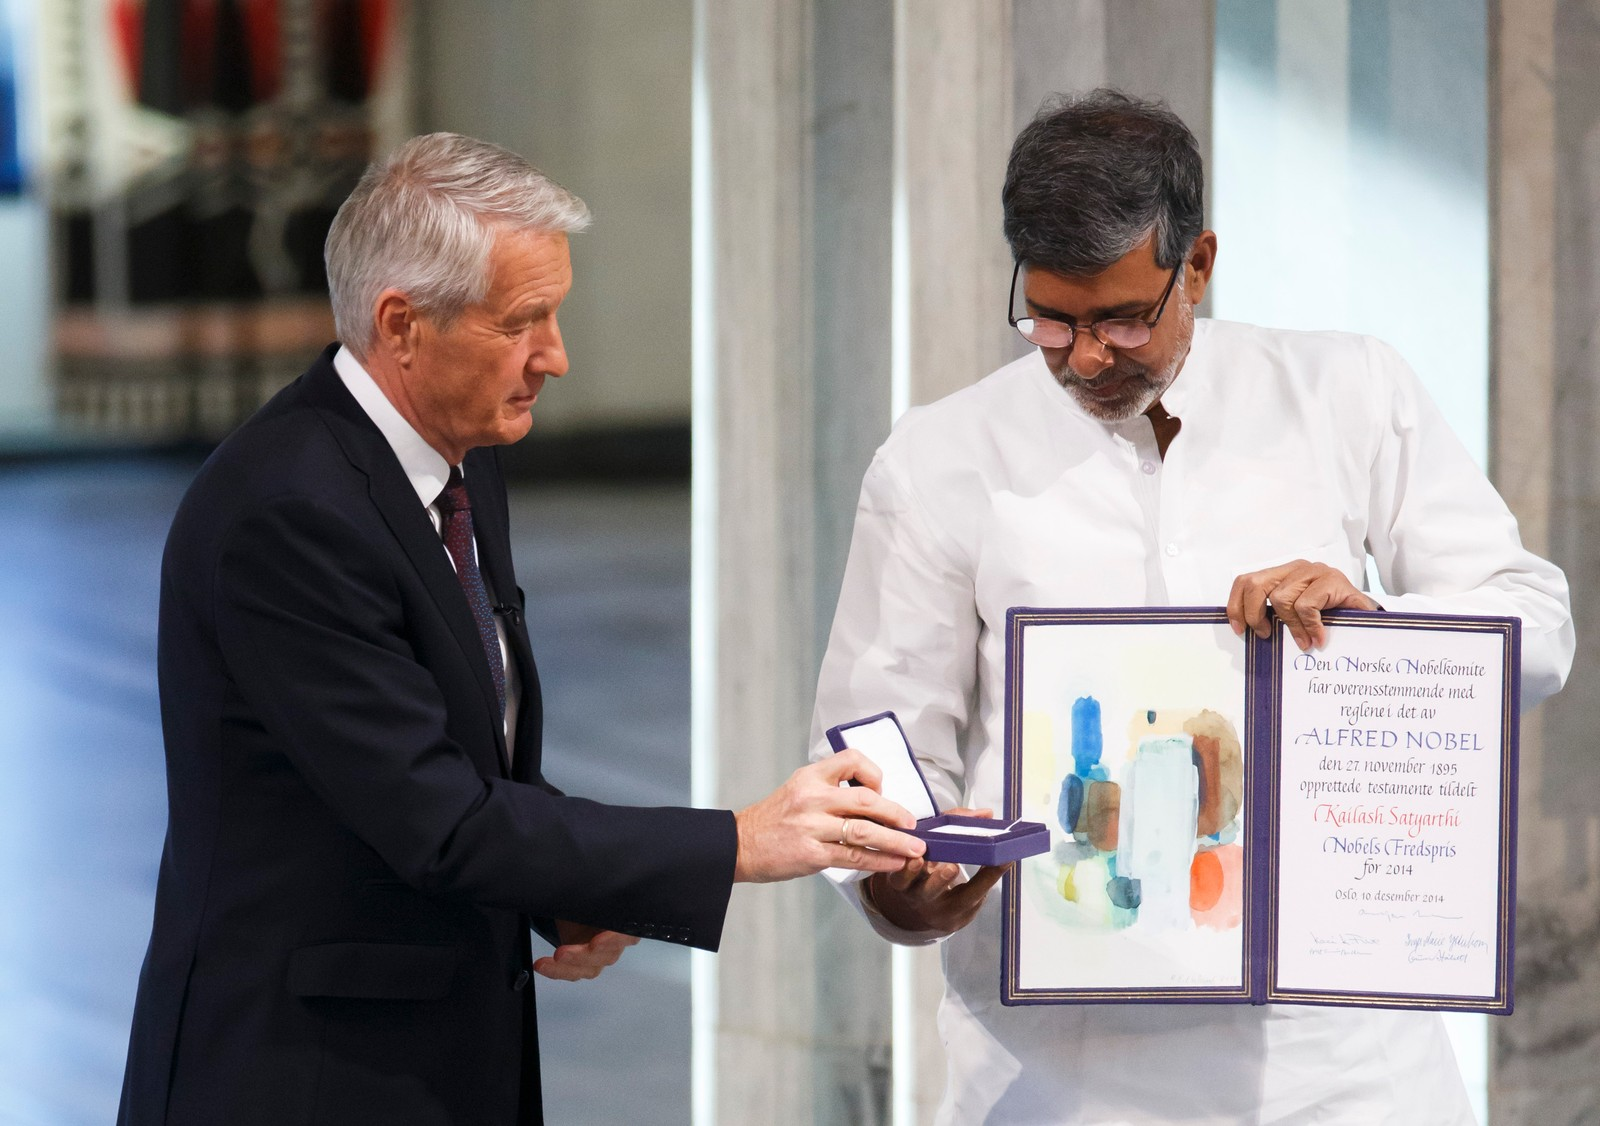 FÅR PRISEN: Fredsprisvinner Kailash Satyarthi.